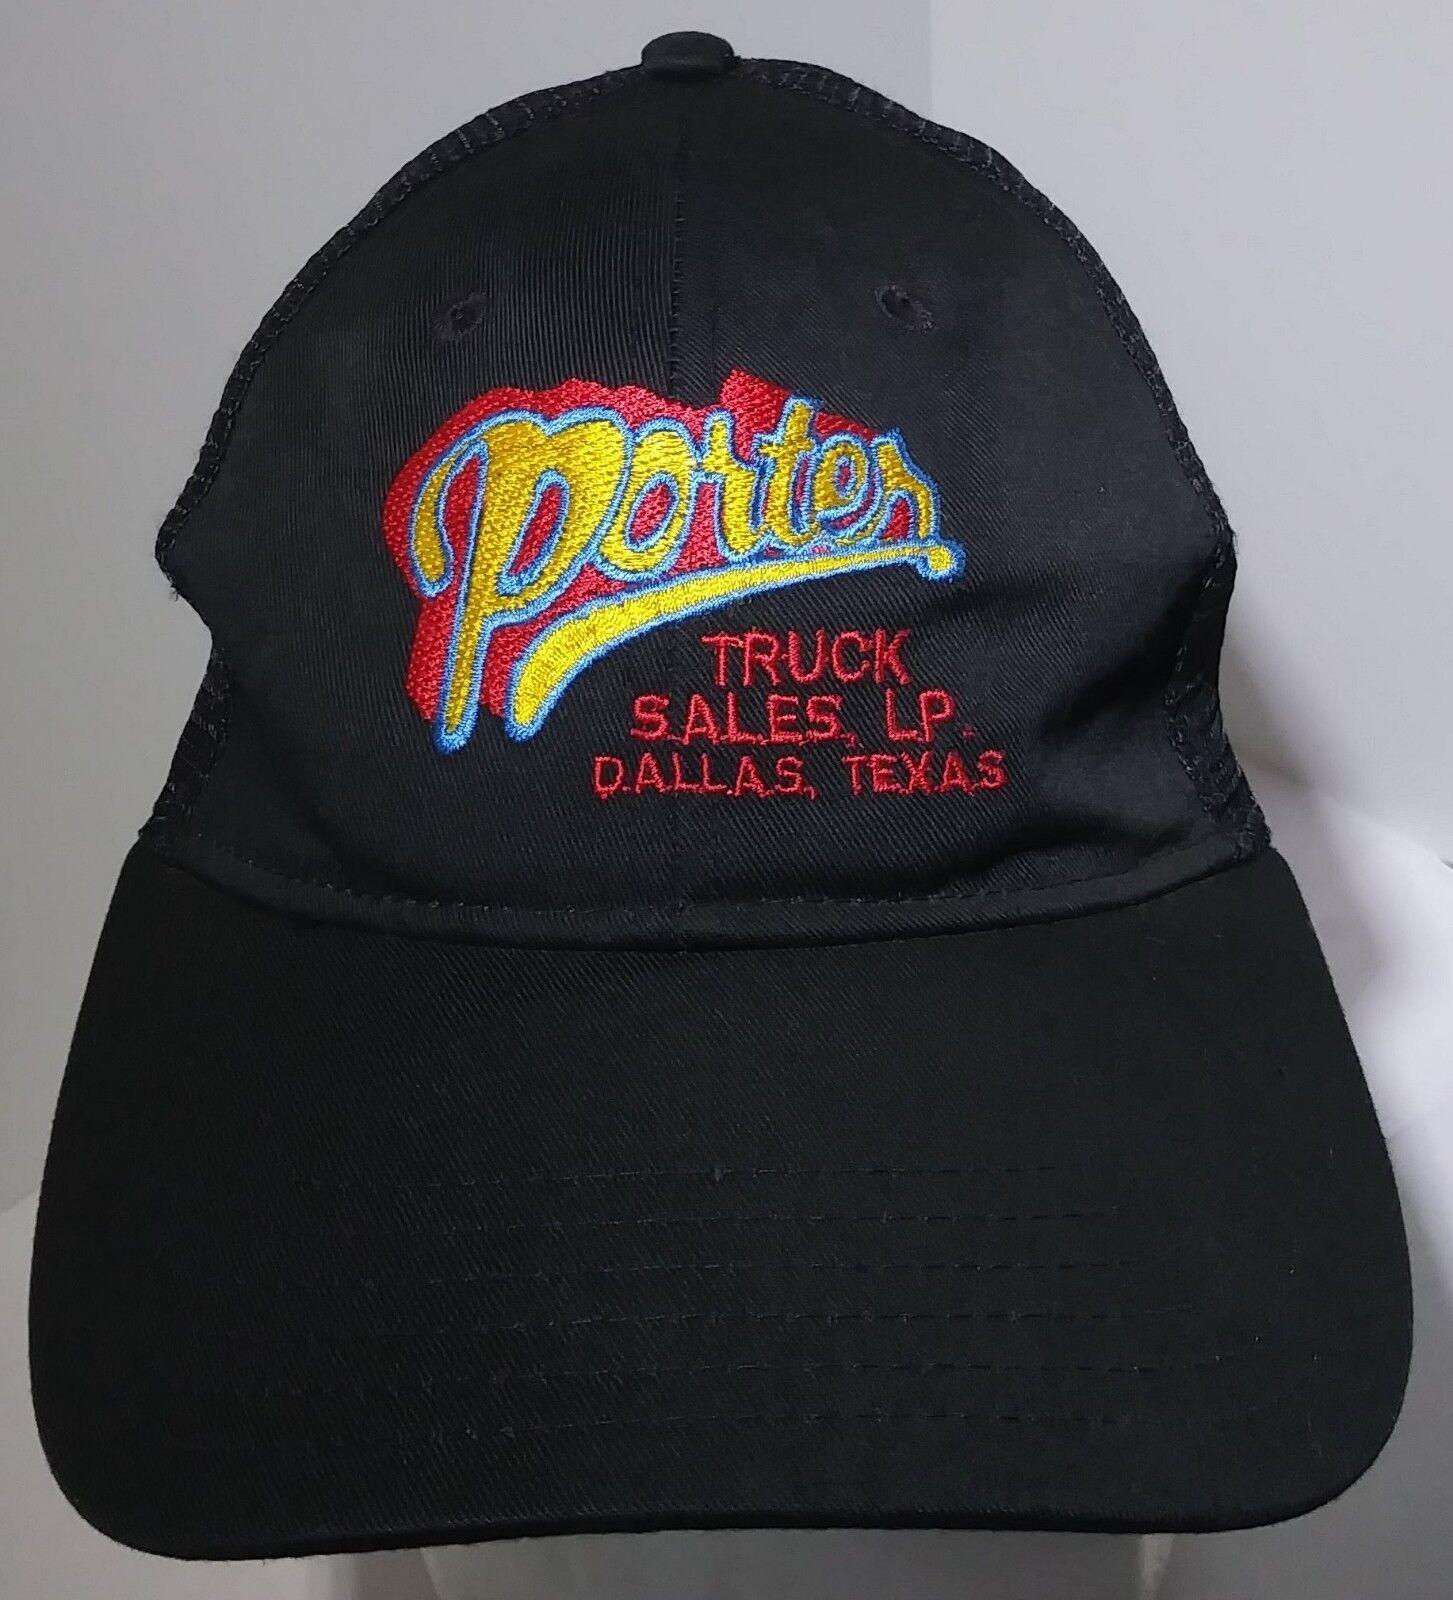 Porter Truck Trucker Sales Dallas Texas Embroidered Trucker Truck Mesh Snapback Black Cap c2940c